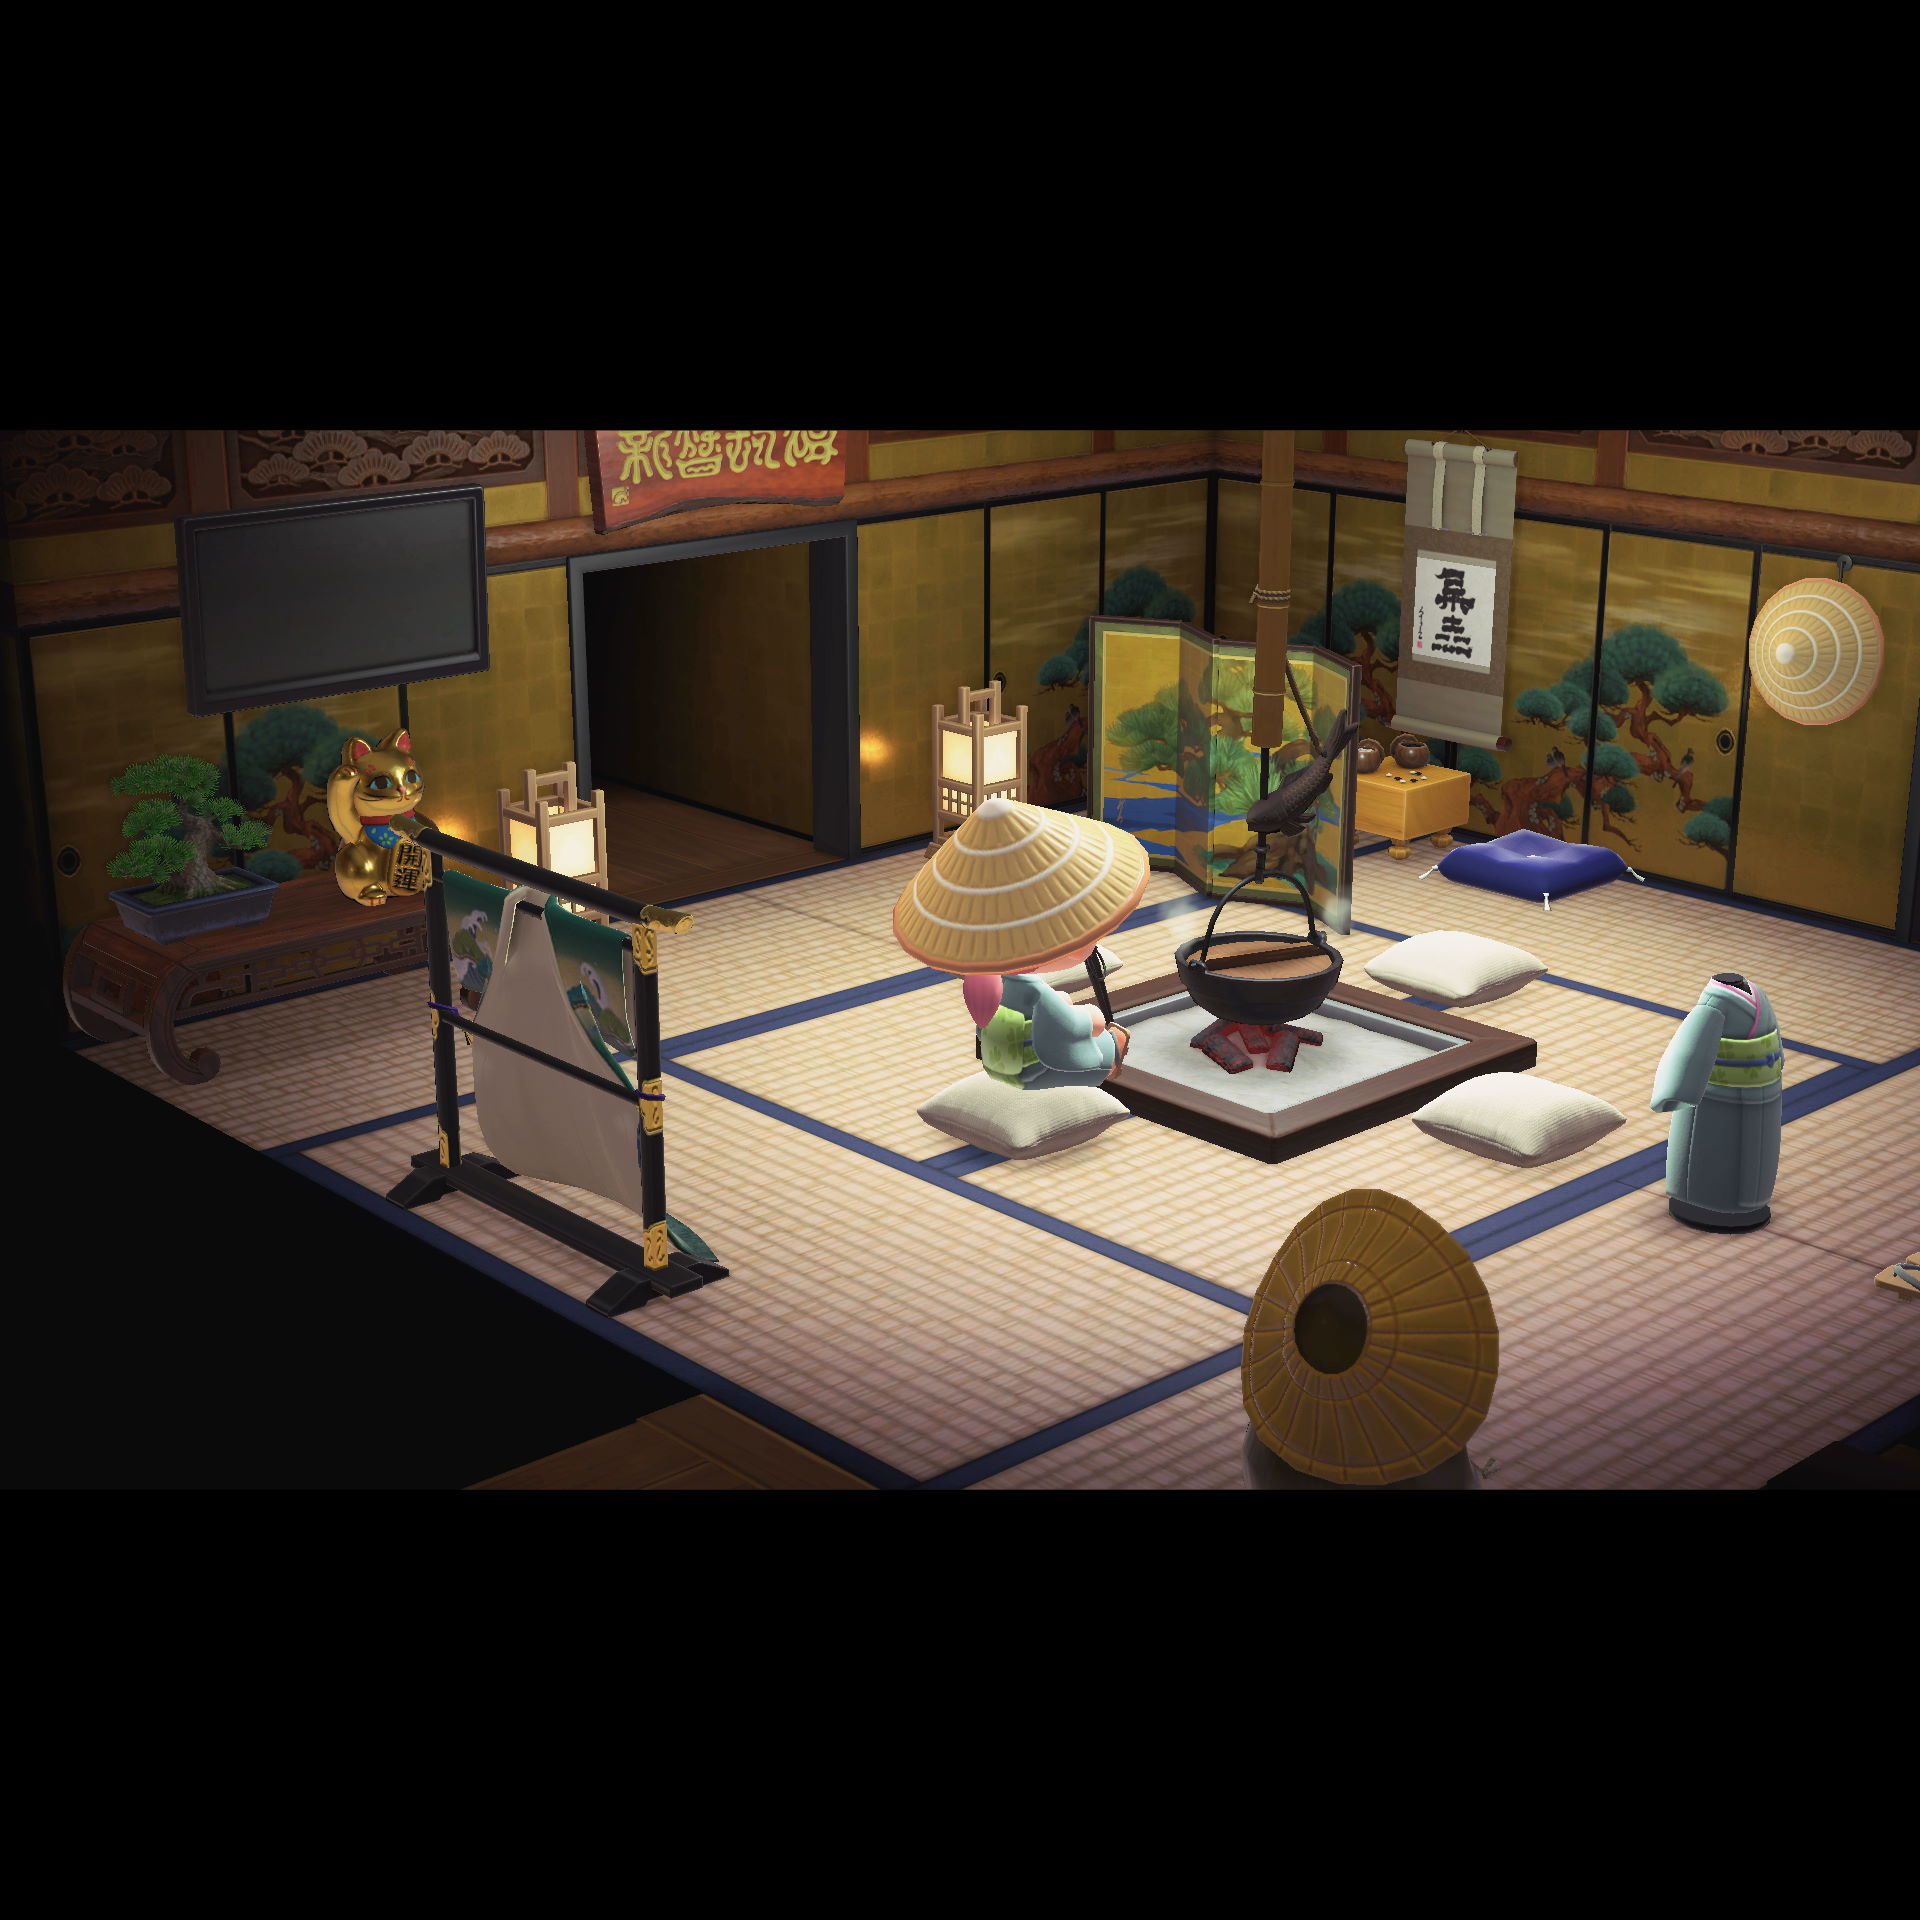 Furniture Japanese Living Room In Game Items Gameflip